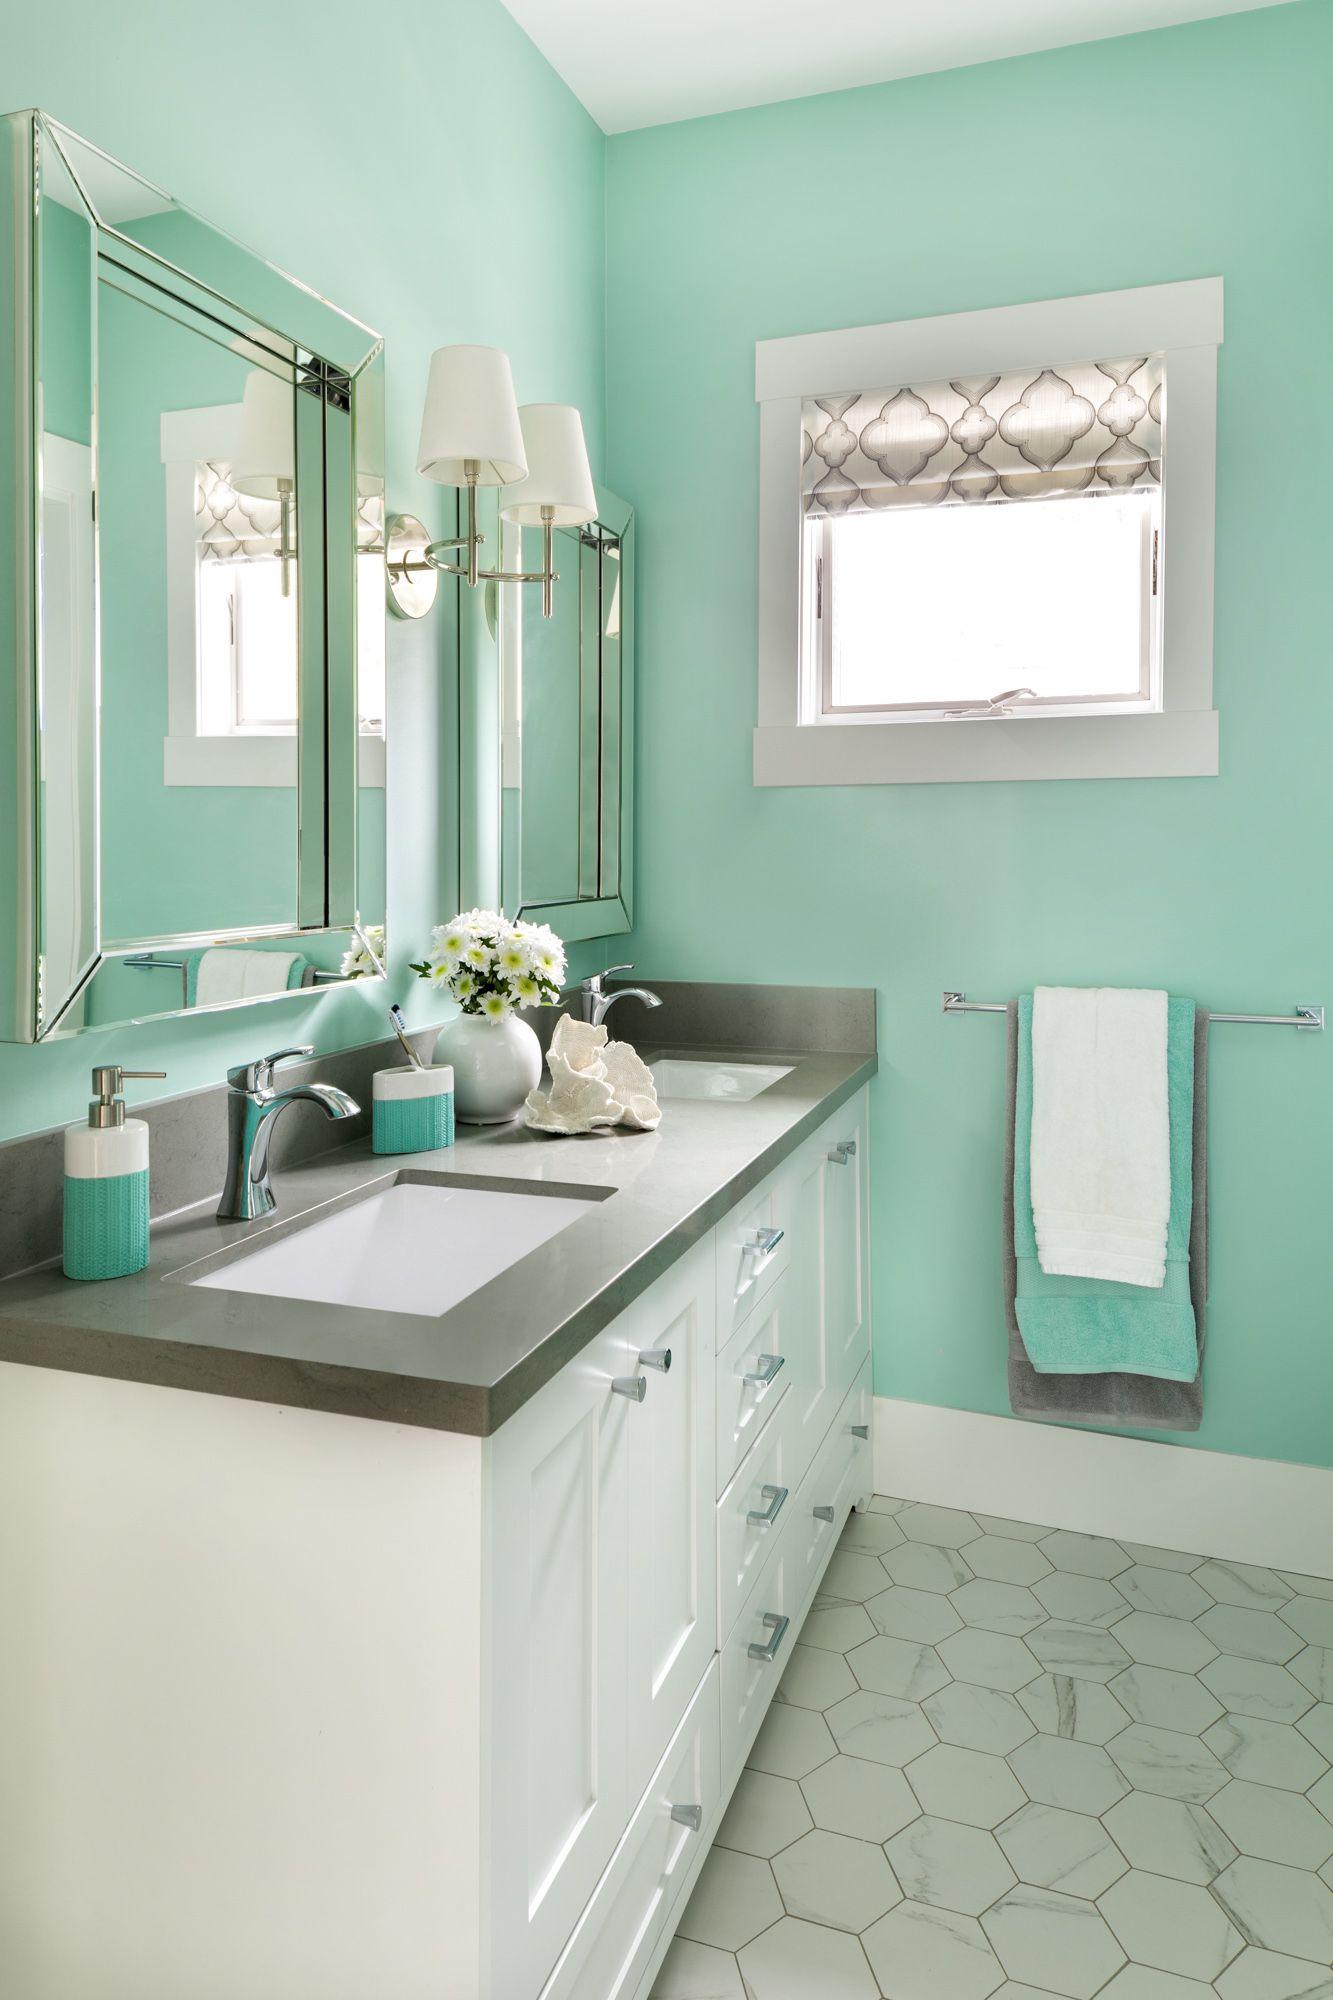 Turquoise Kids Bathroom Before After Maria Killam Turquoise Bathroom Turquoise Bathroom Decor Blue Bathroom Interior